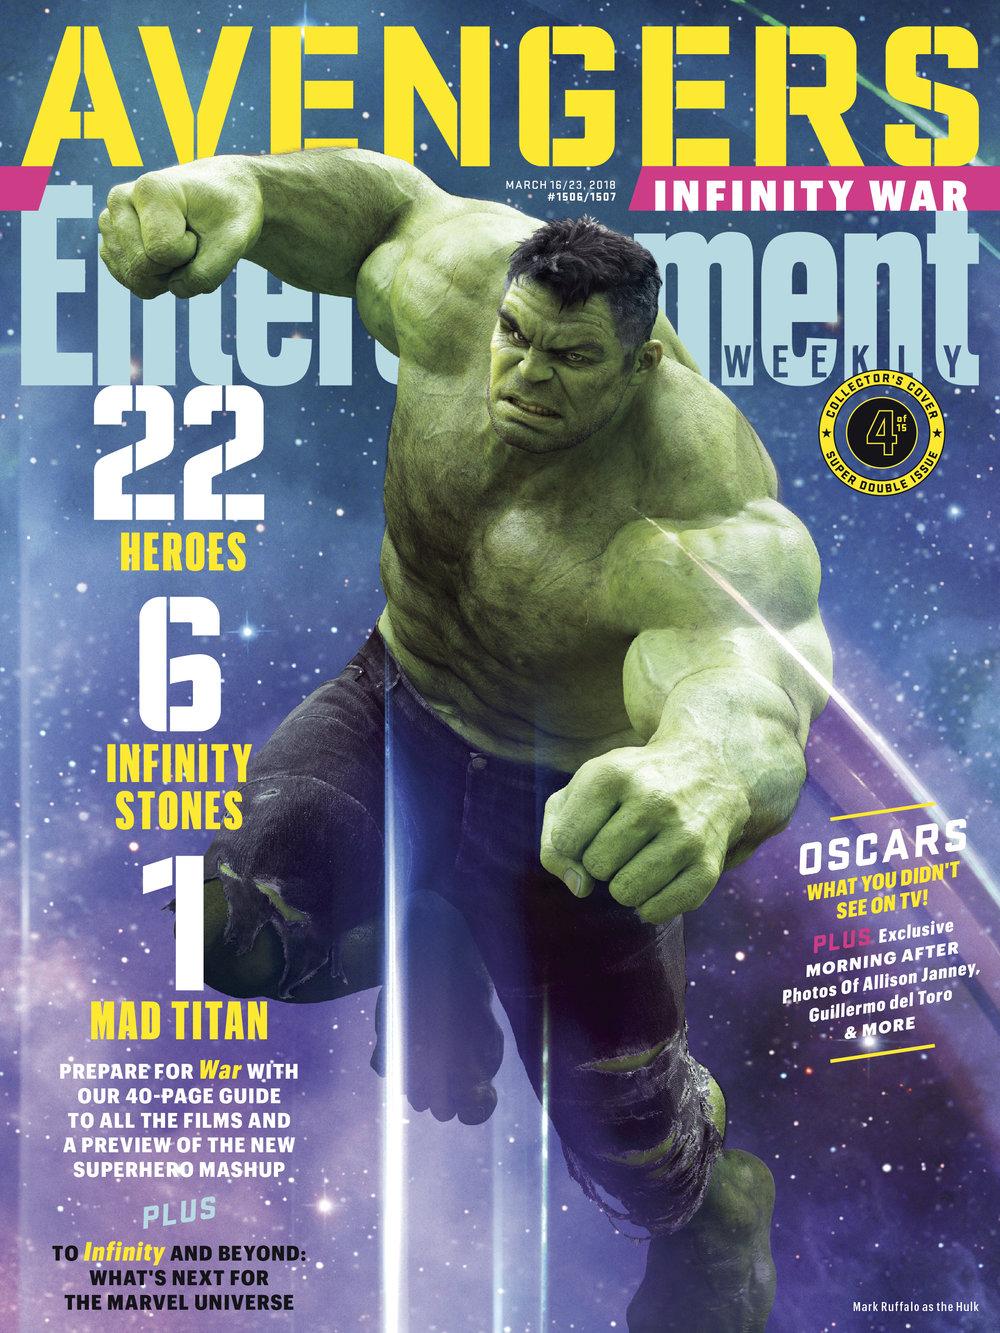 ewcvr_Hulk.promo.jpg